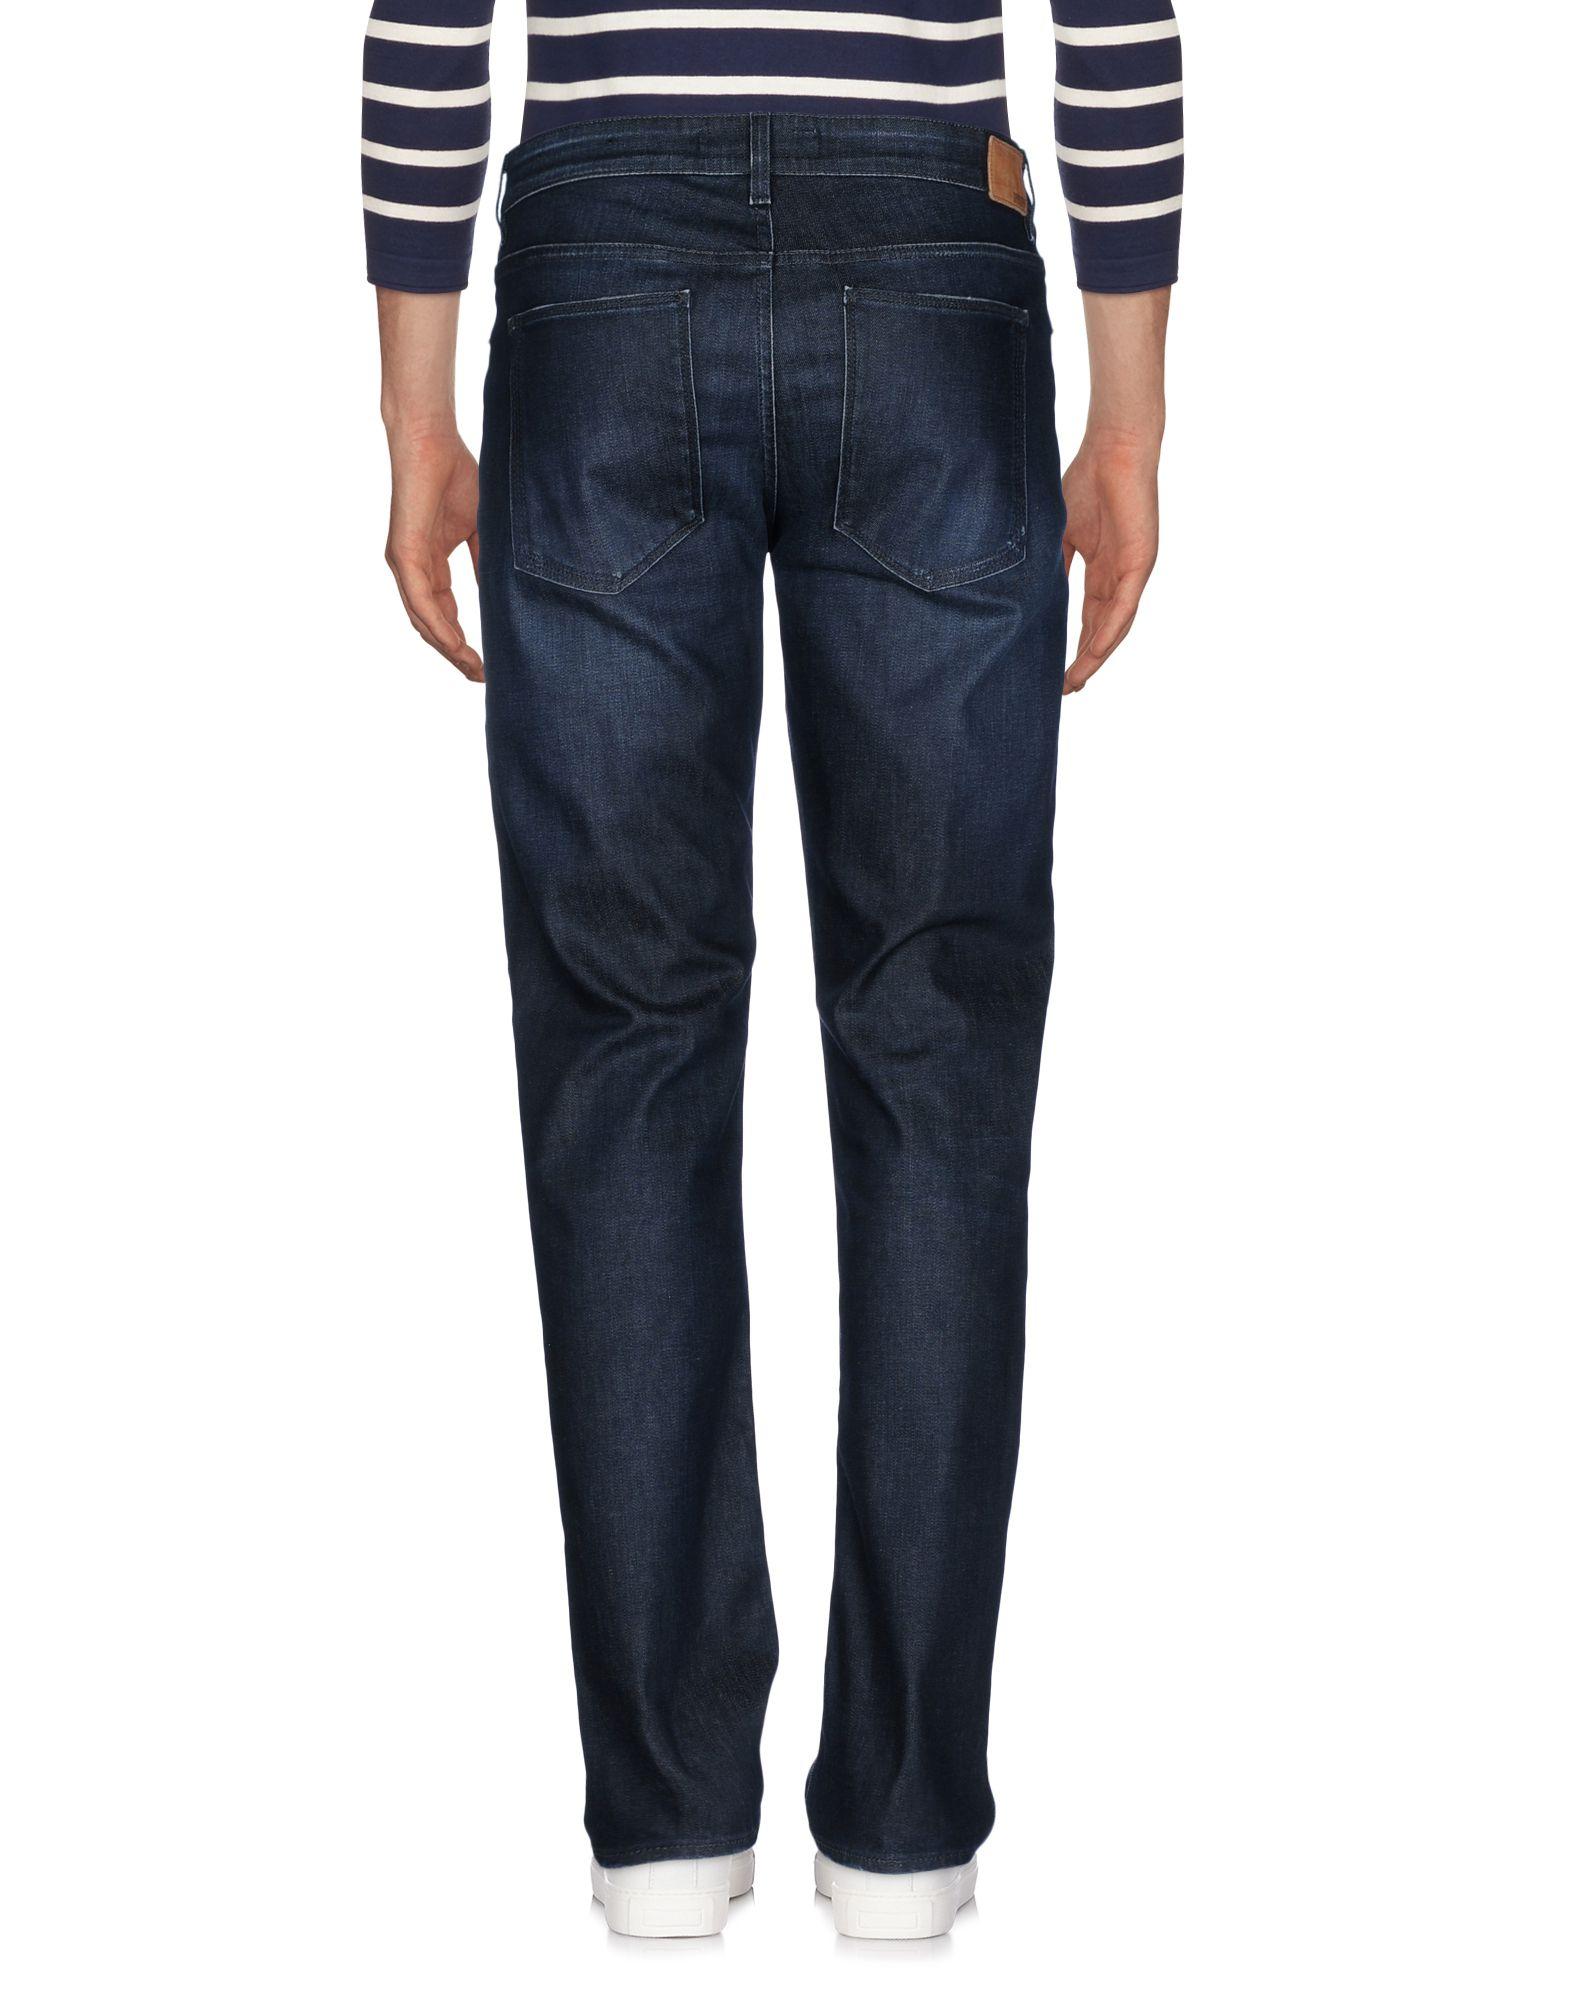 Pantaloni Jeans Drykorn Uomo - - - 42633828RV 798e05